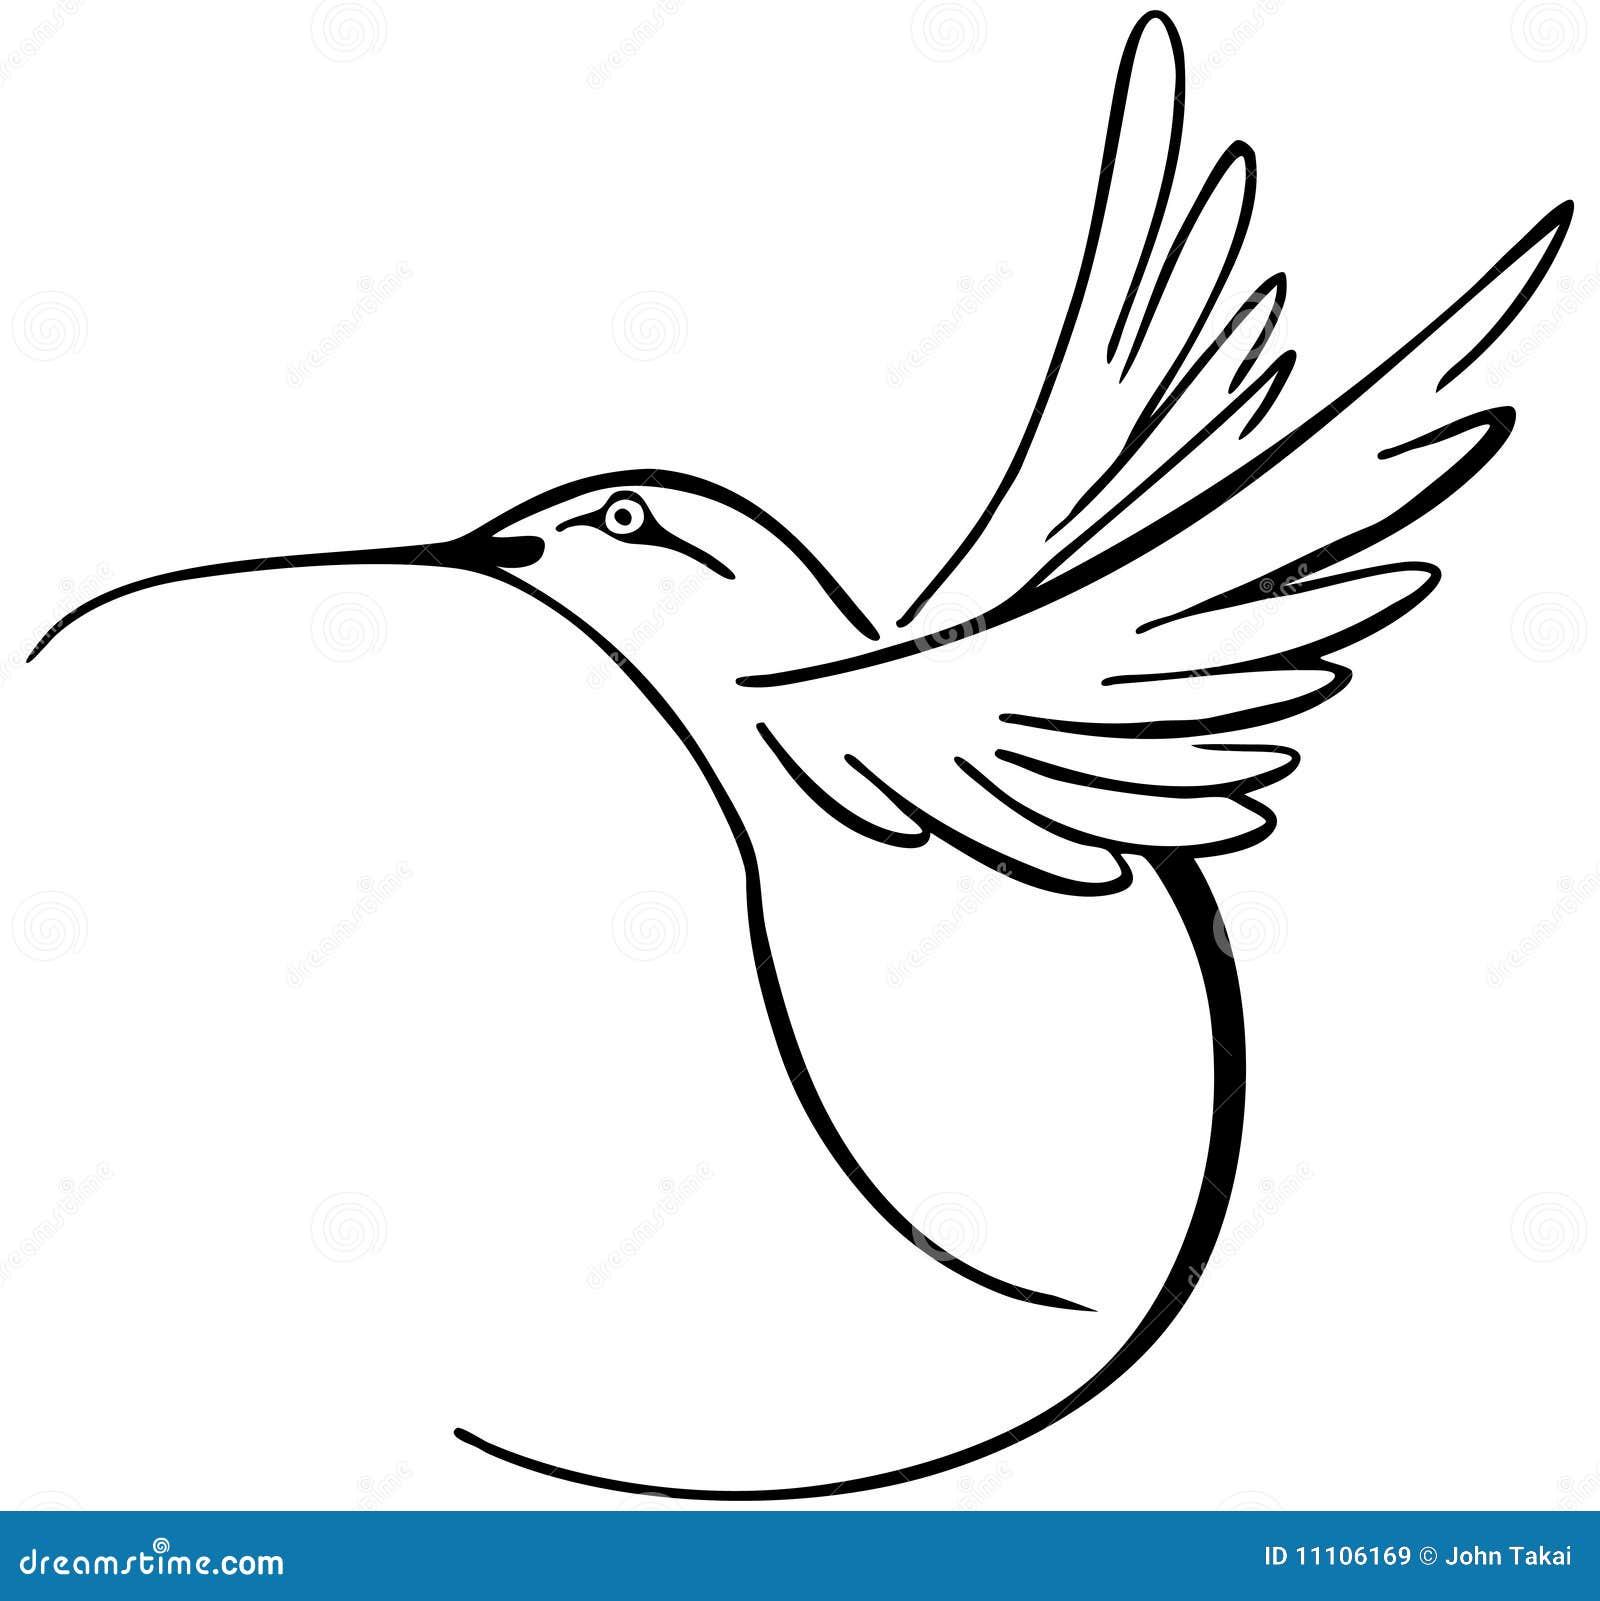 Hummingbird And Honeysuckle Tattoo Hummingbird royalty free stock